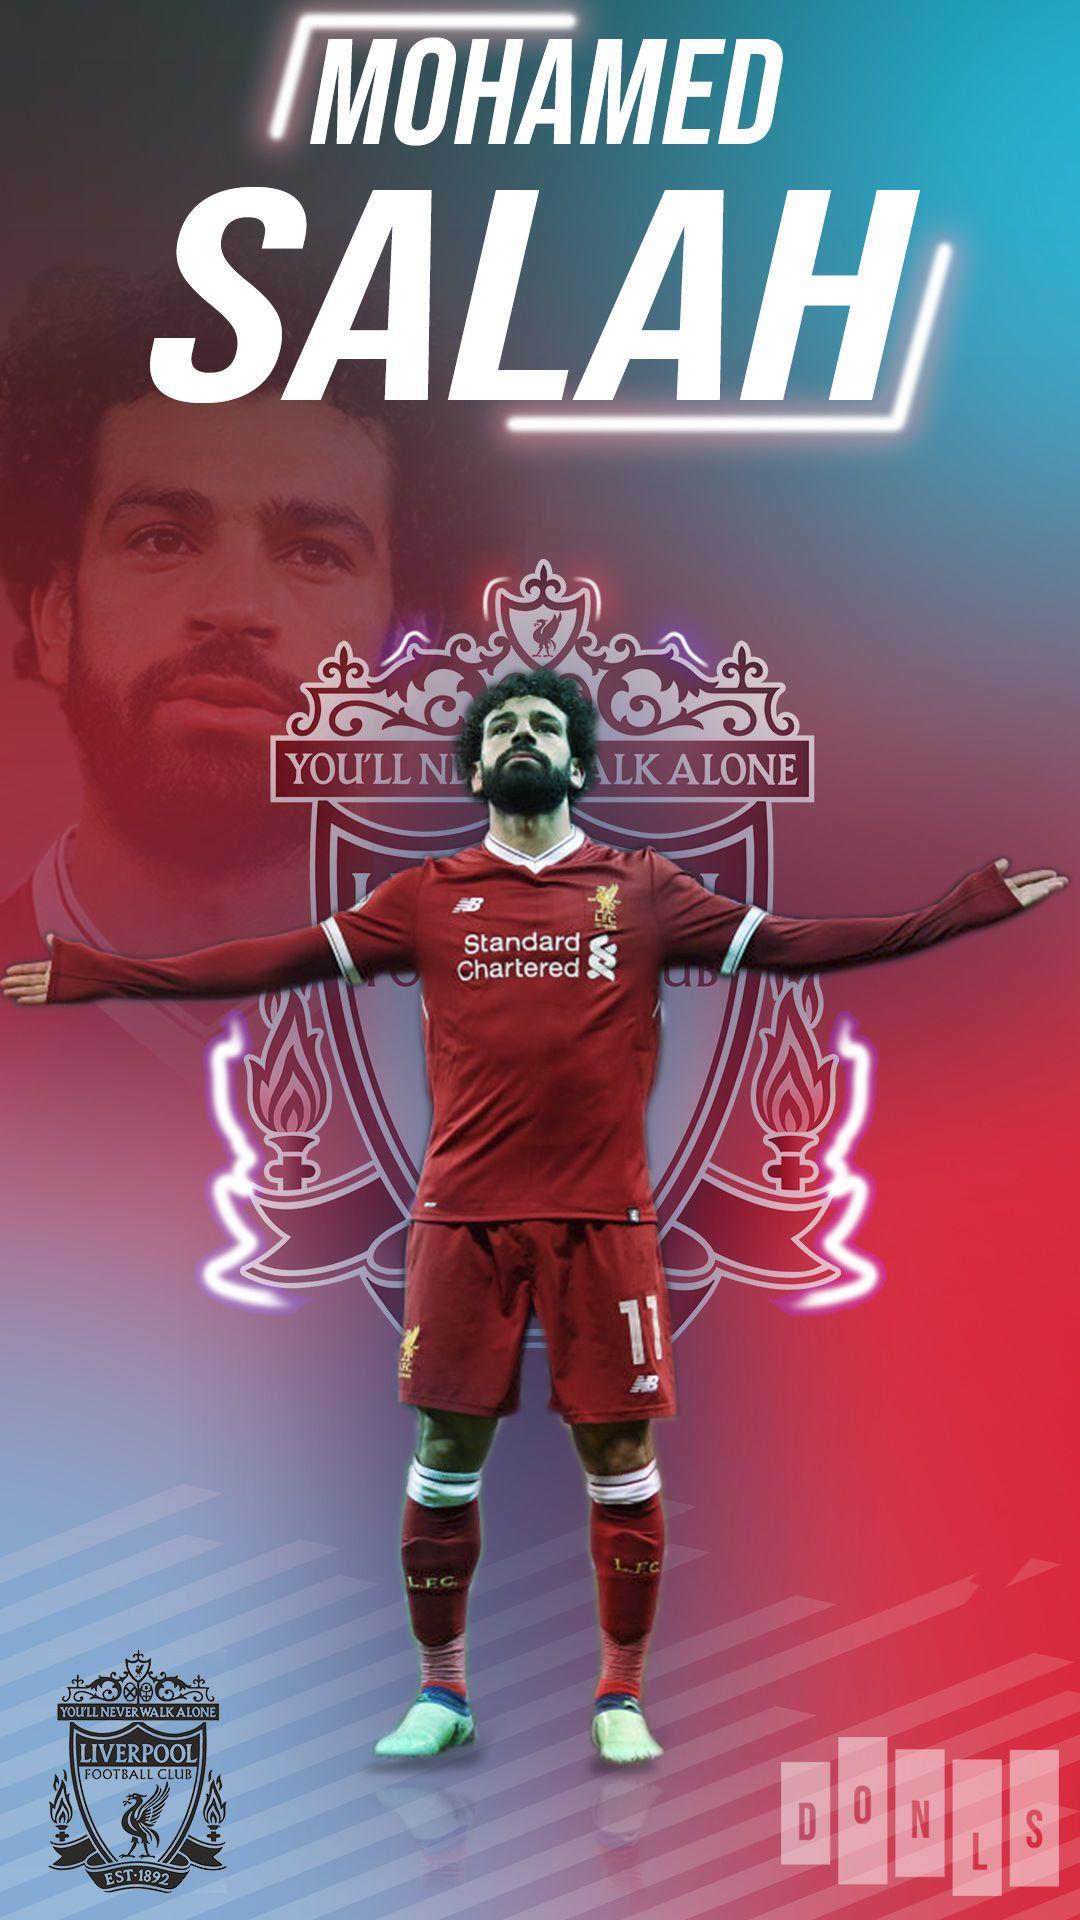 Pin By Foo Ii On Sports Wallpapers Salah Liverpool Mohamed Salah Liverpool Football